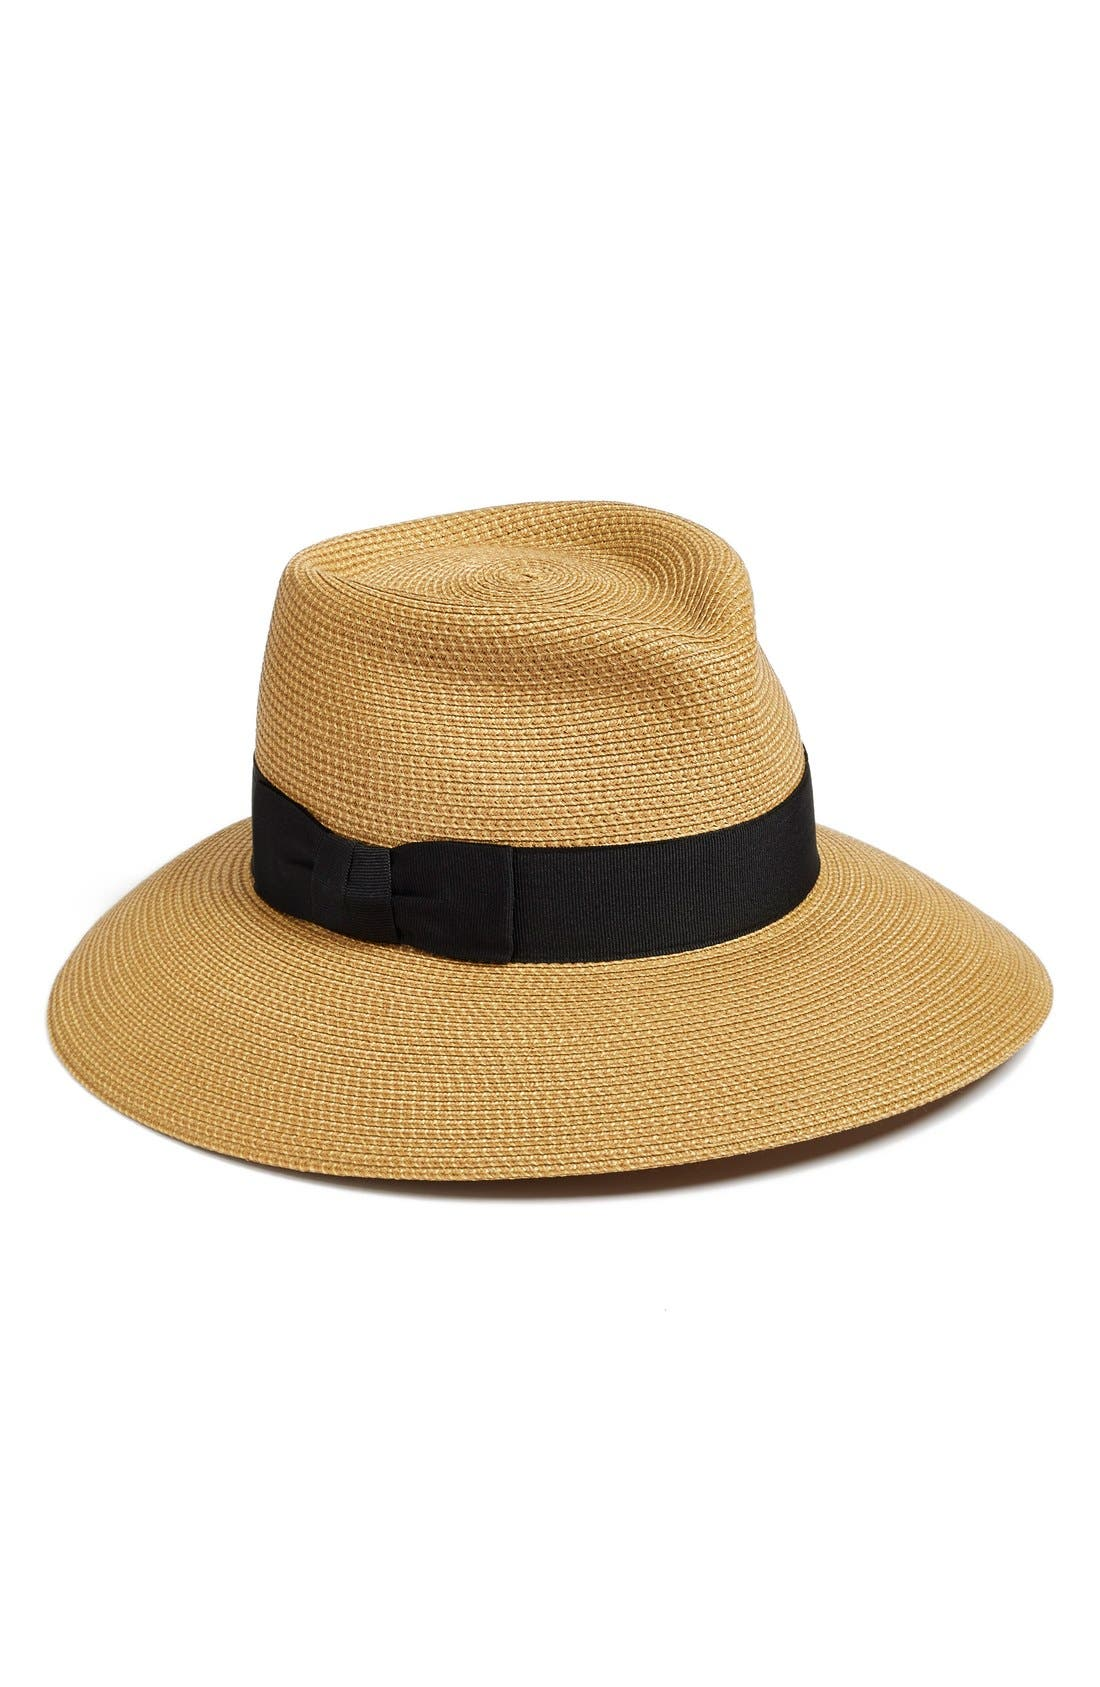 'Phoenix' Packable Fedora Sun Hat